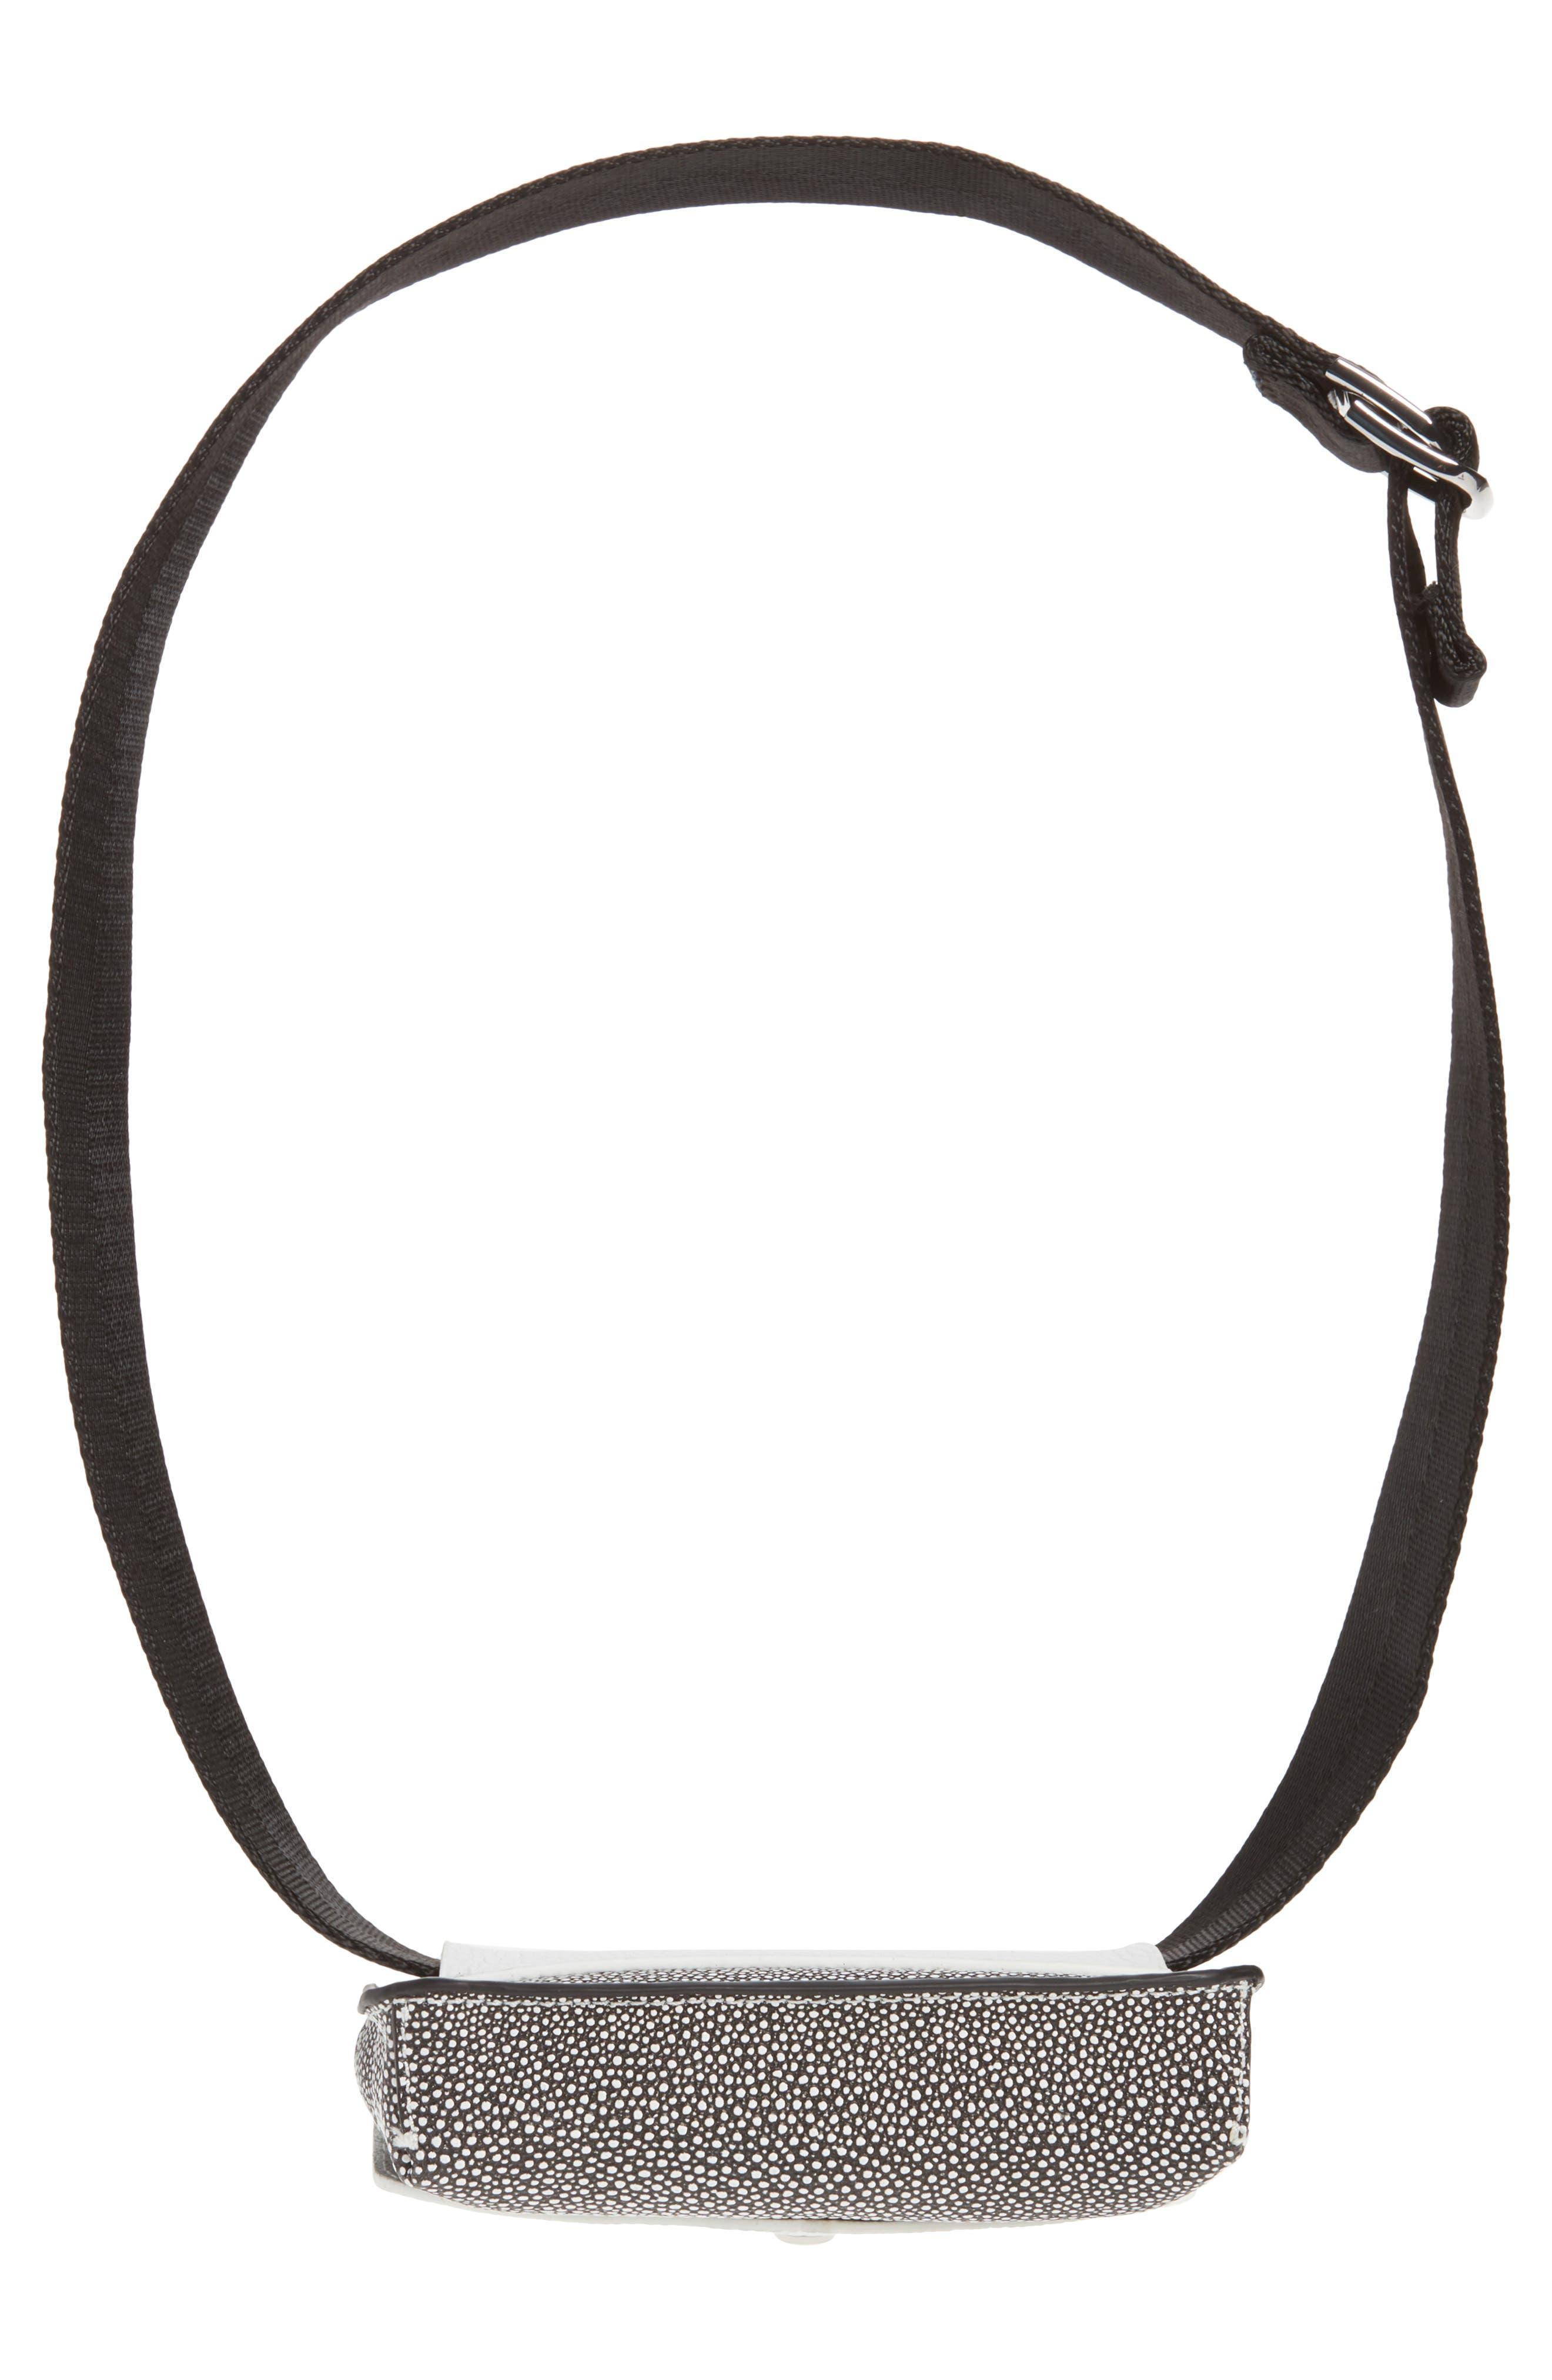 Vivi Calfskin Leather Convertible Belt Bag,                             Alternate thumbnail 8, color,                             Chalk Stingray